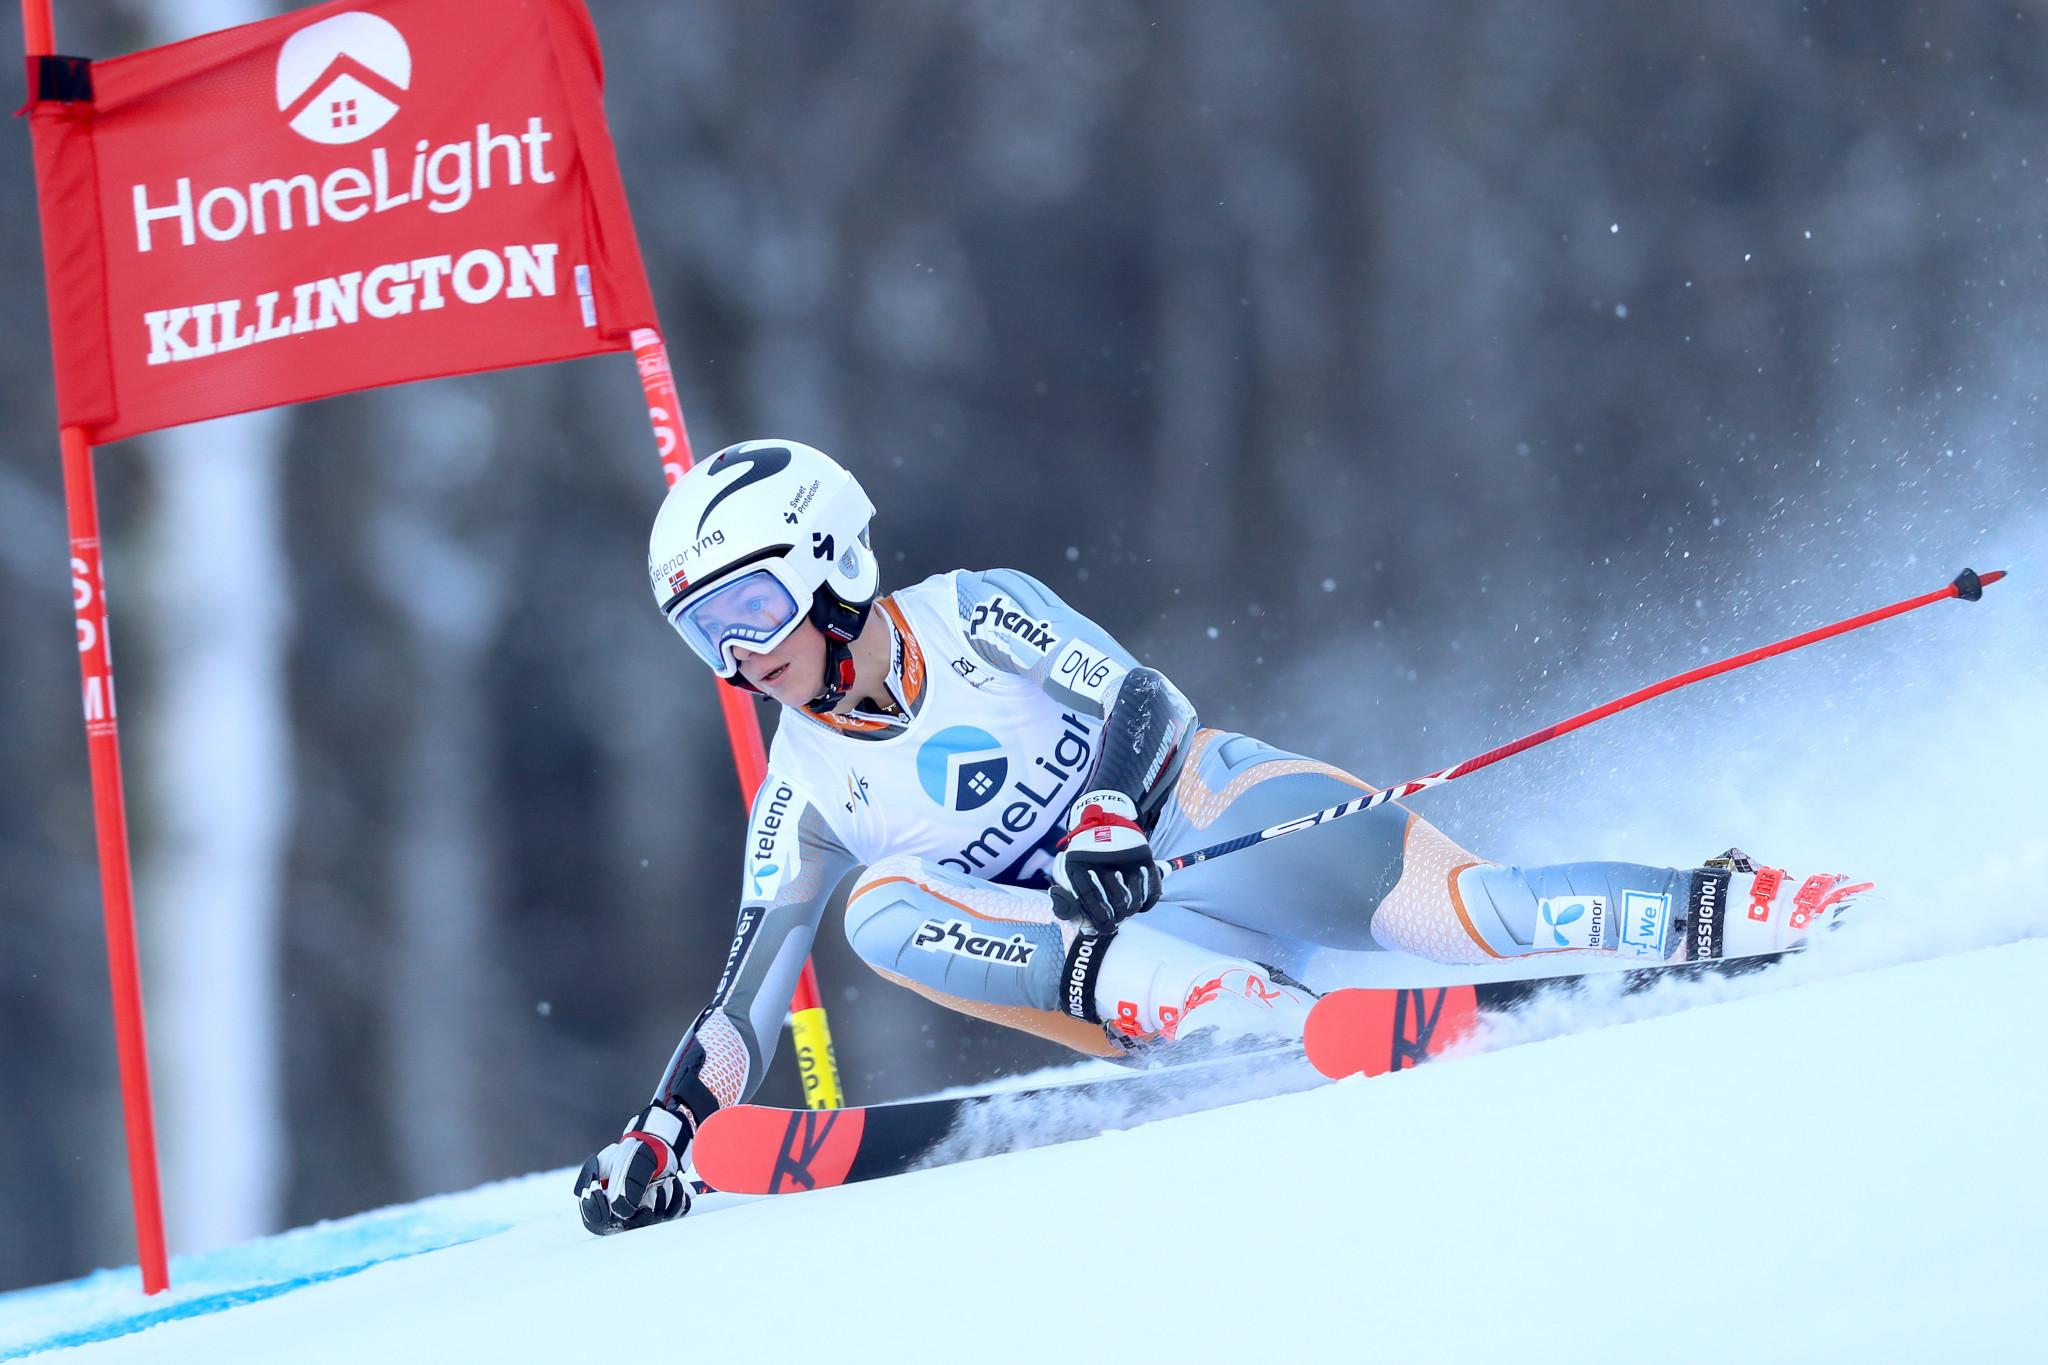 Killington to return to women's FIS Alpine Ski World Cup circuit